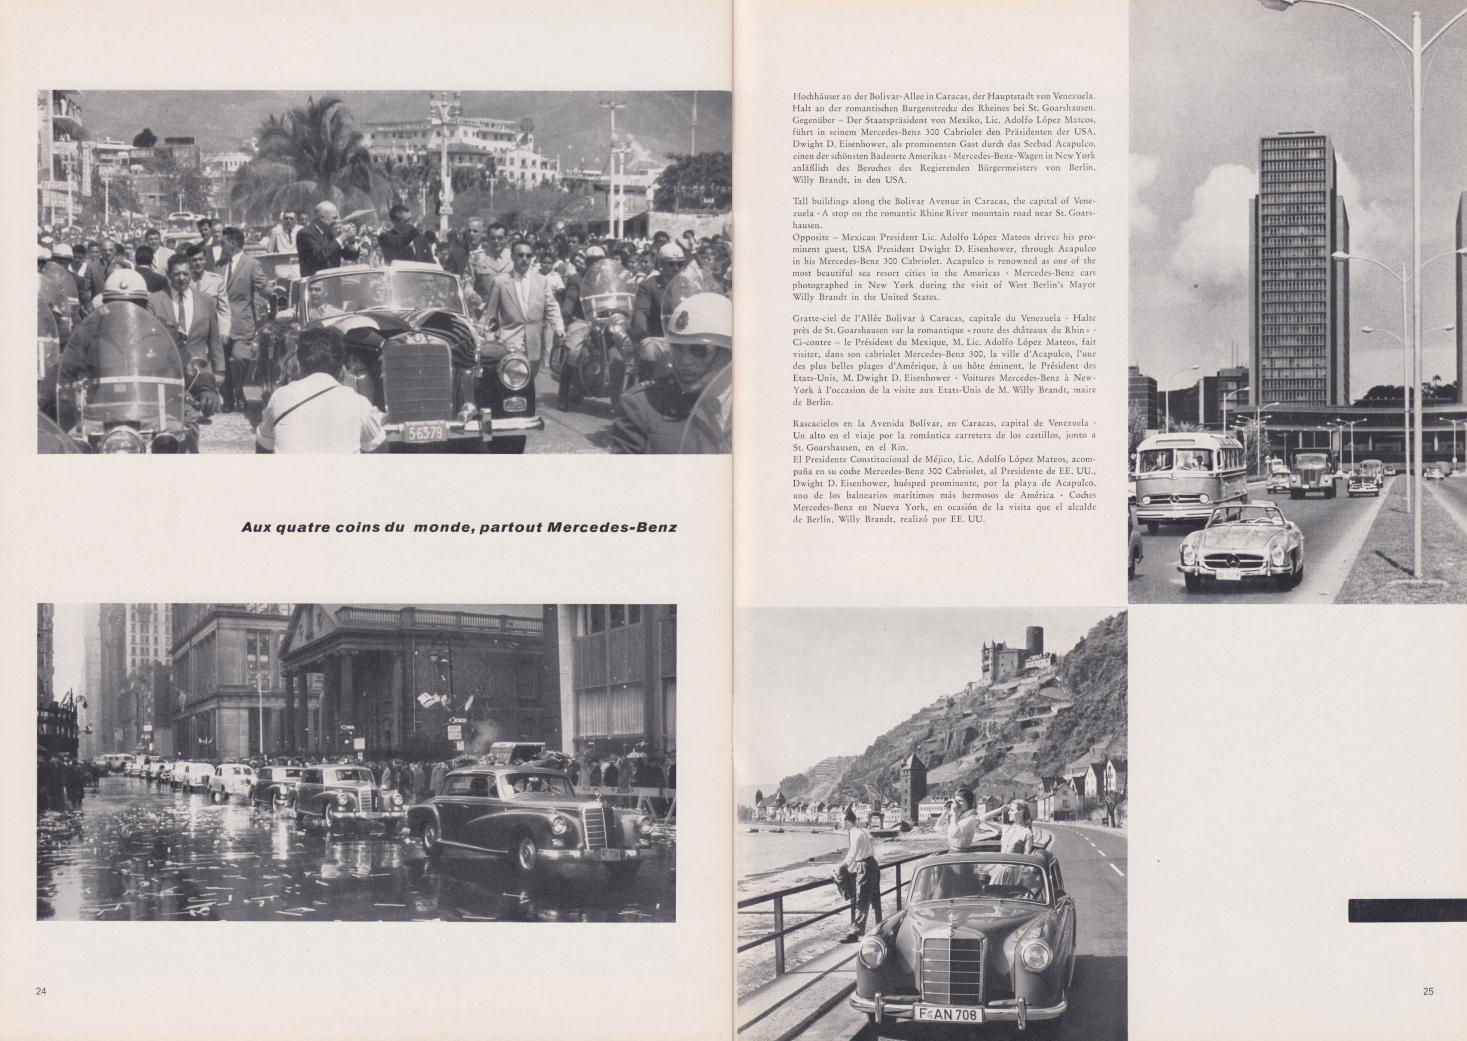 (REVISTA): Periódico In aller welt n.º 31 - Mercedes-Benz no mundo - 1959 - multilingue 013